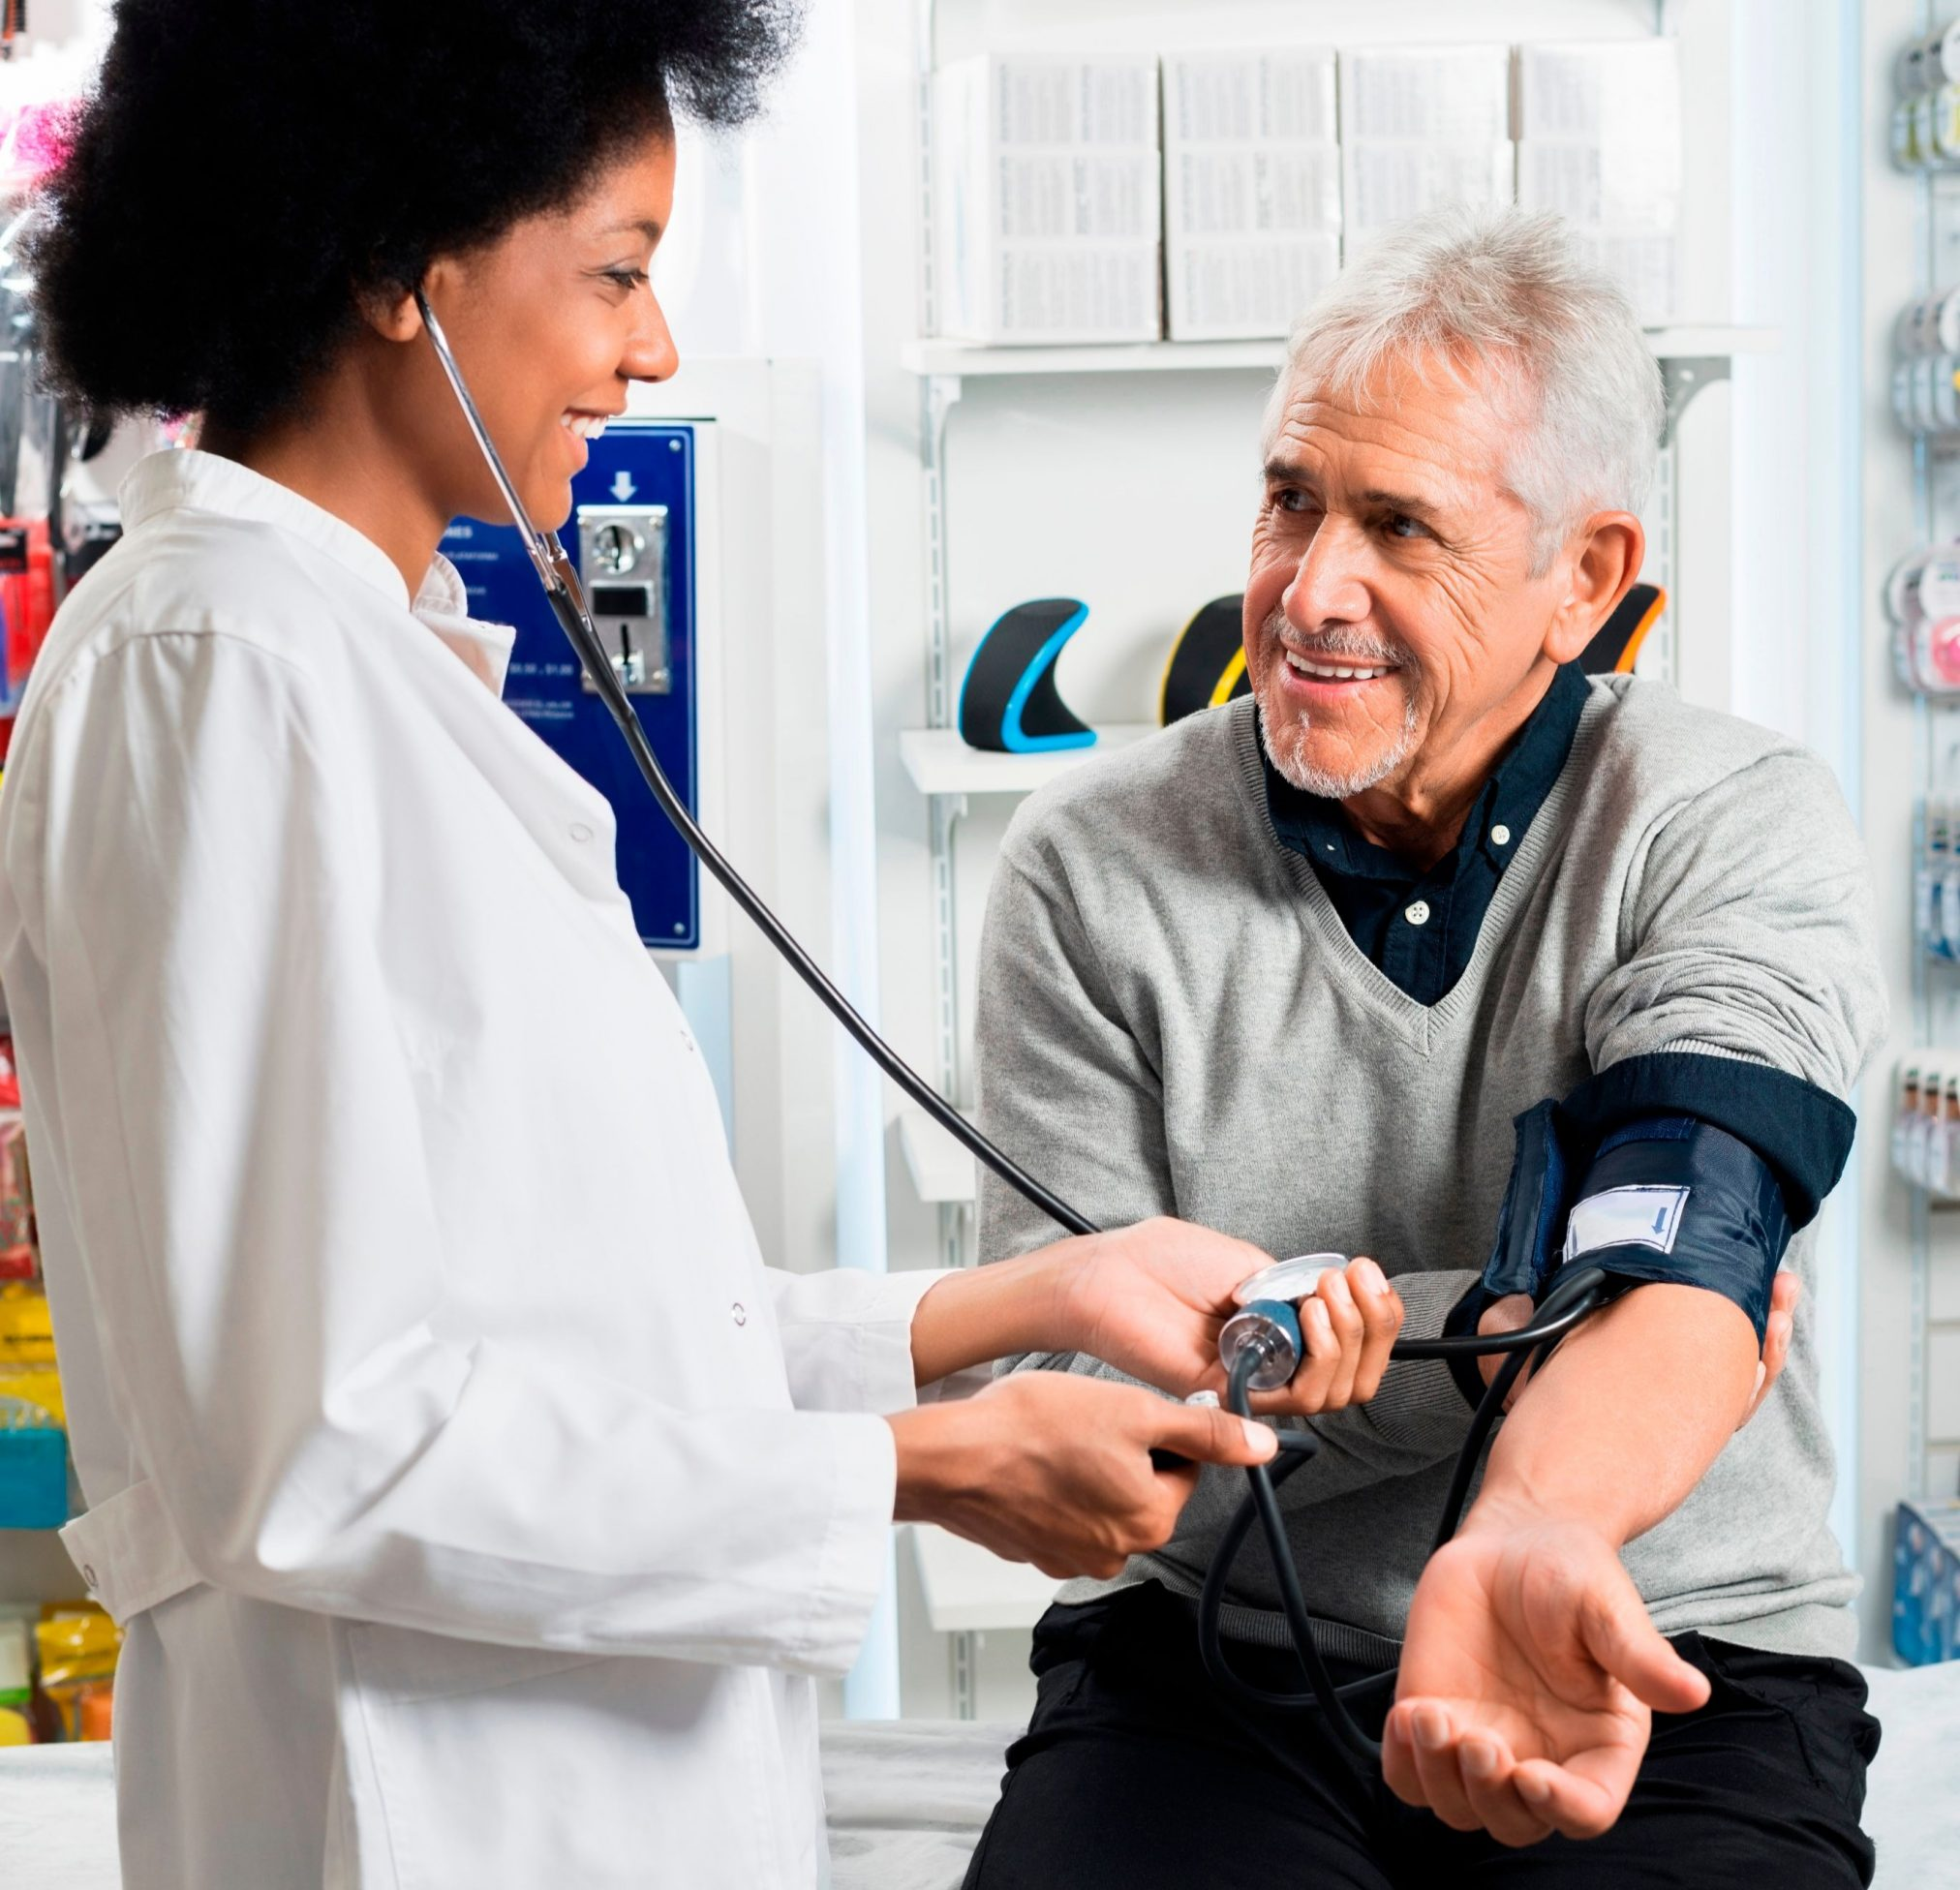 pharmacist checking blood pressure of senior man